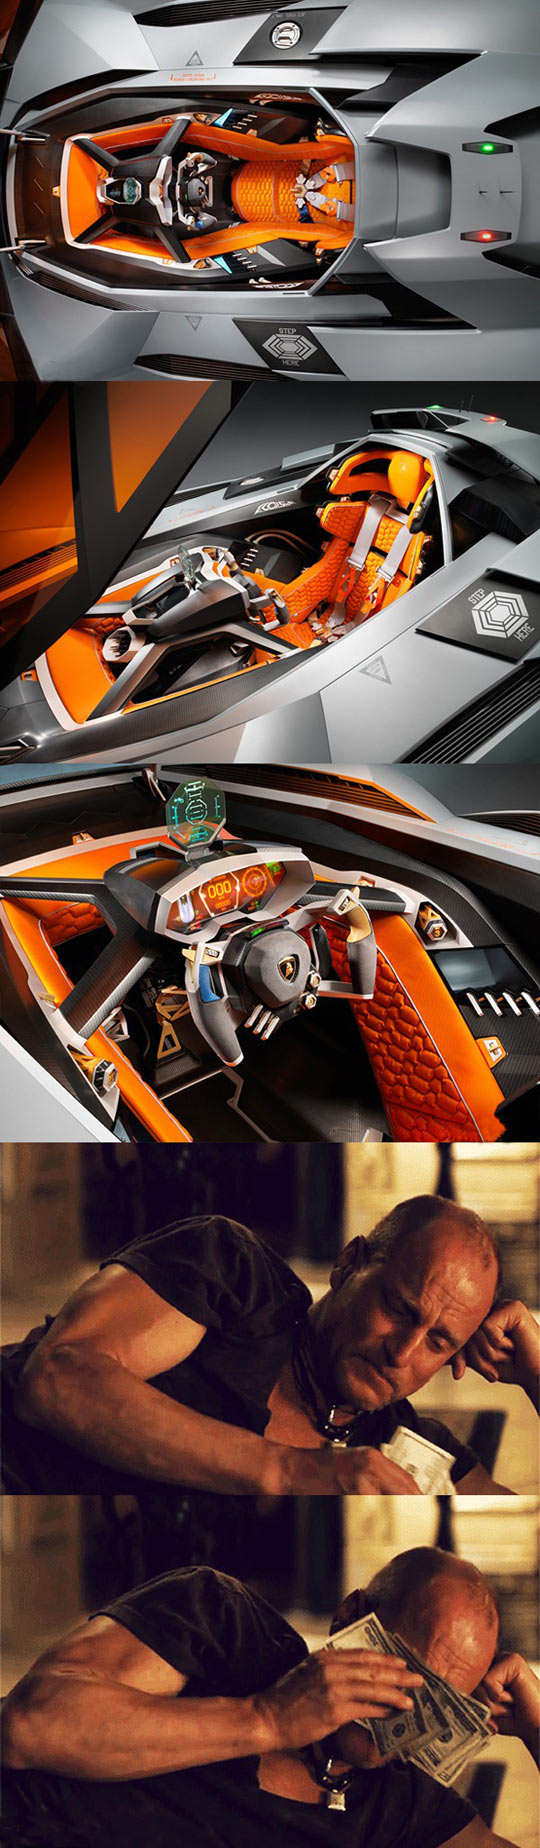 funny-car-seater-Lamborghini-money